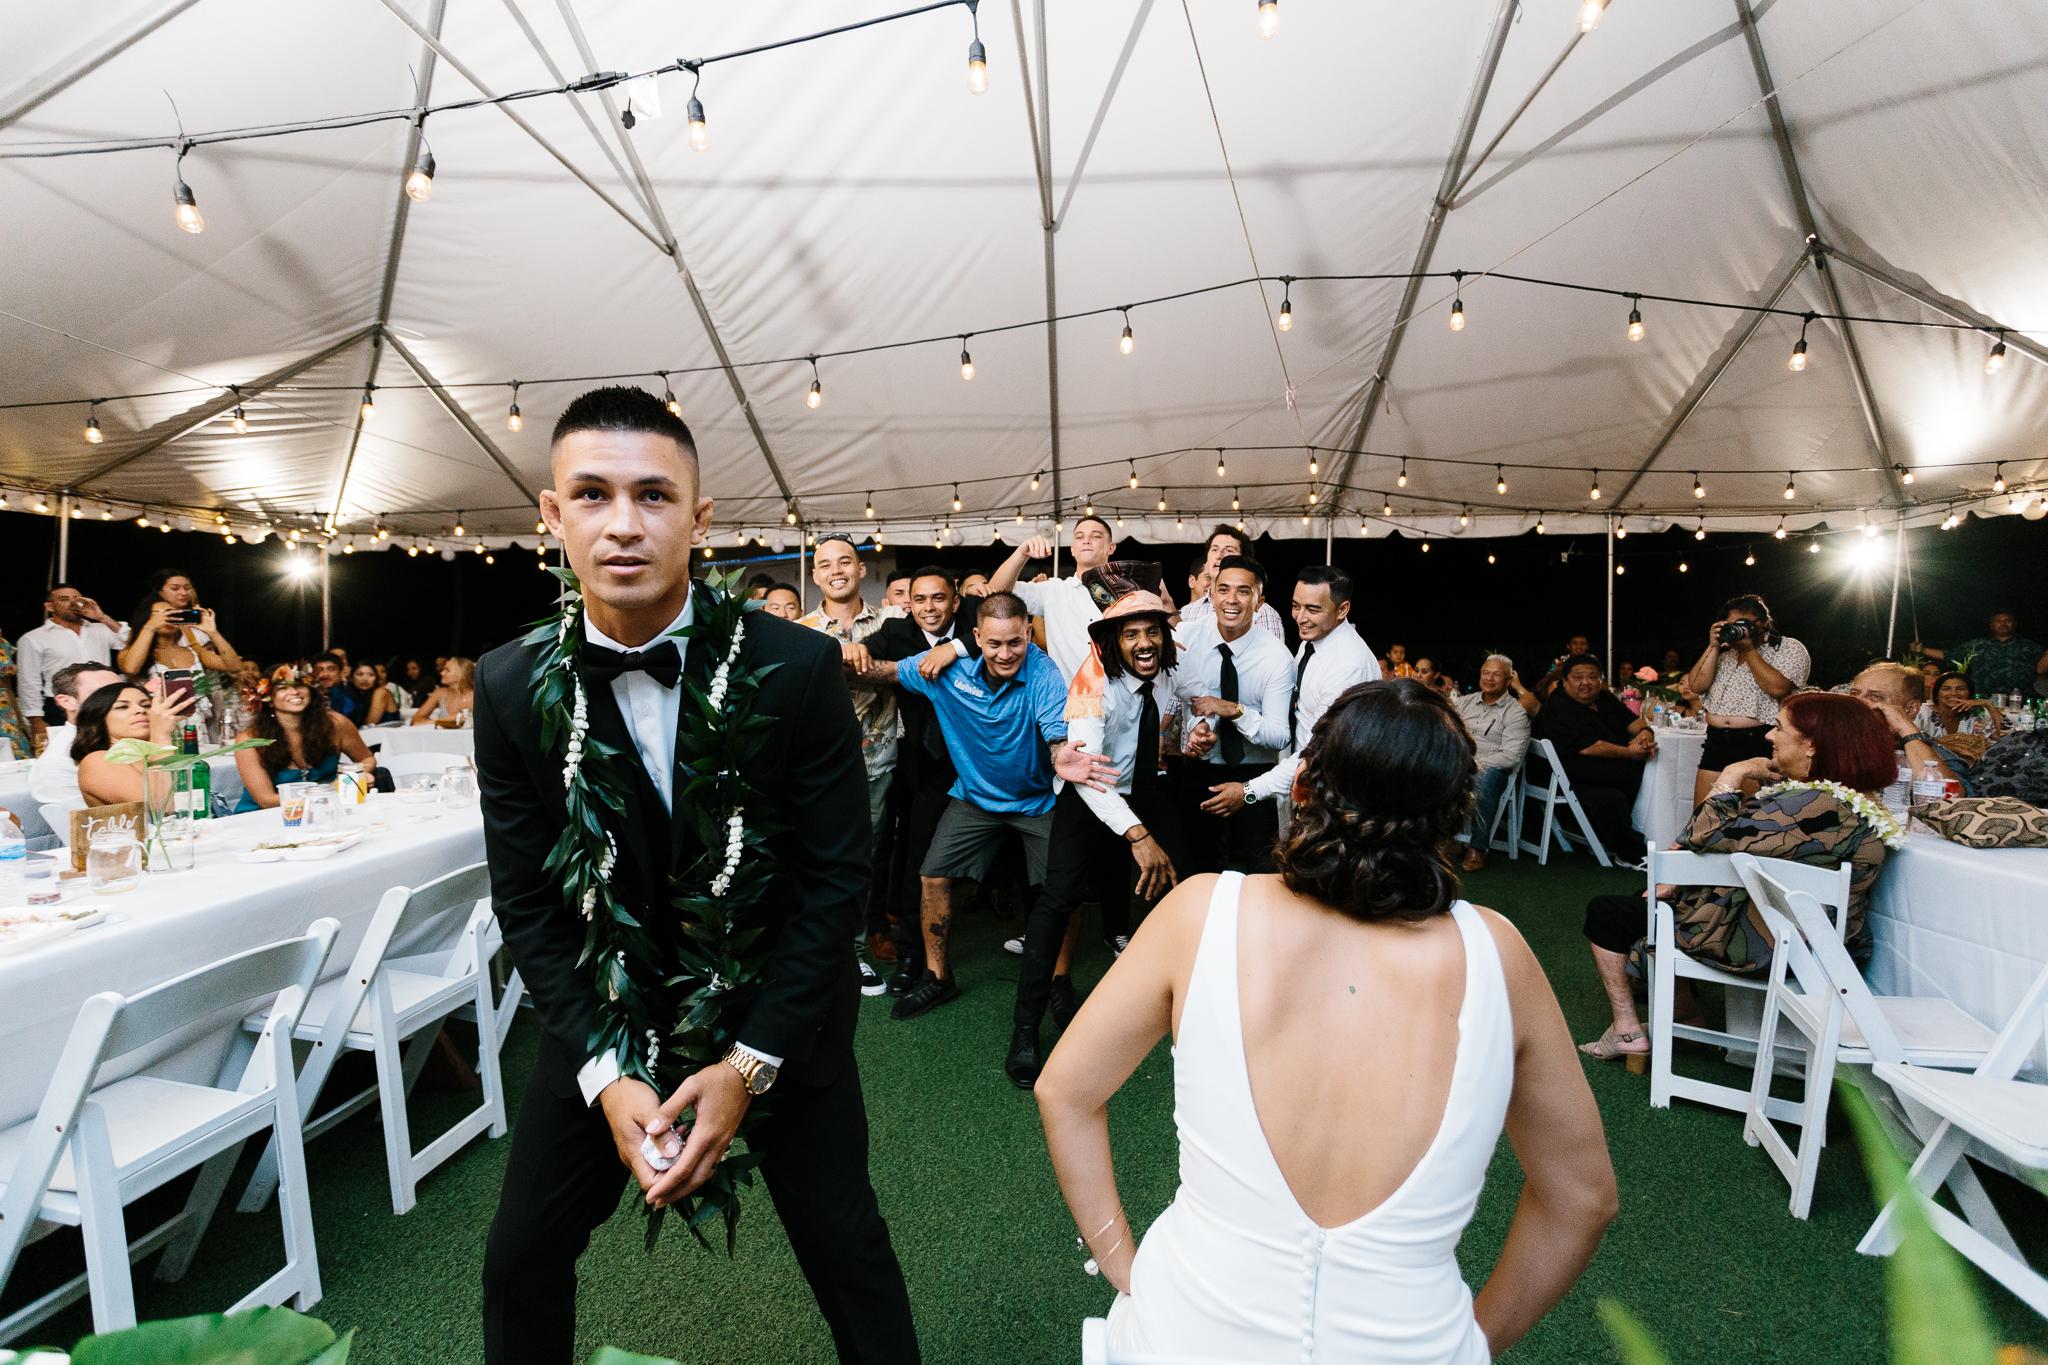 Kualoa_Ranch_Wedding_Photographer_Tone_Hawaii-56.jpg